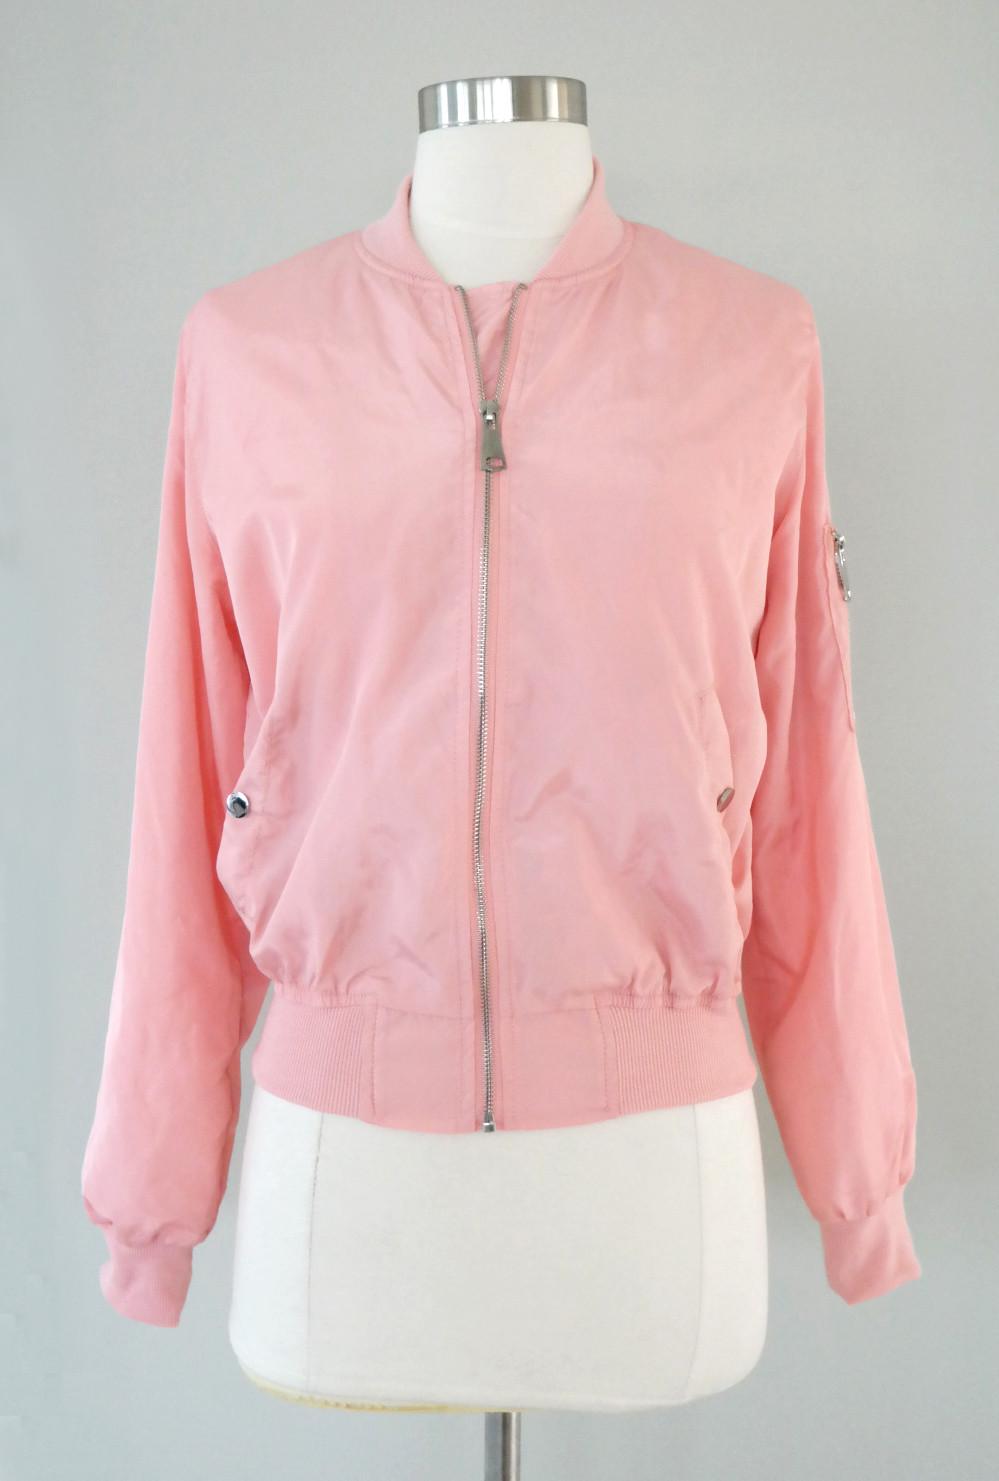 Womens pink jackets